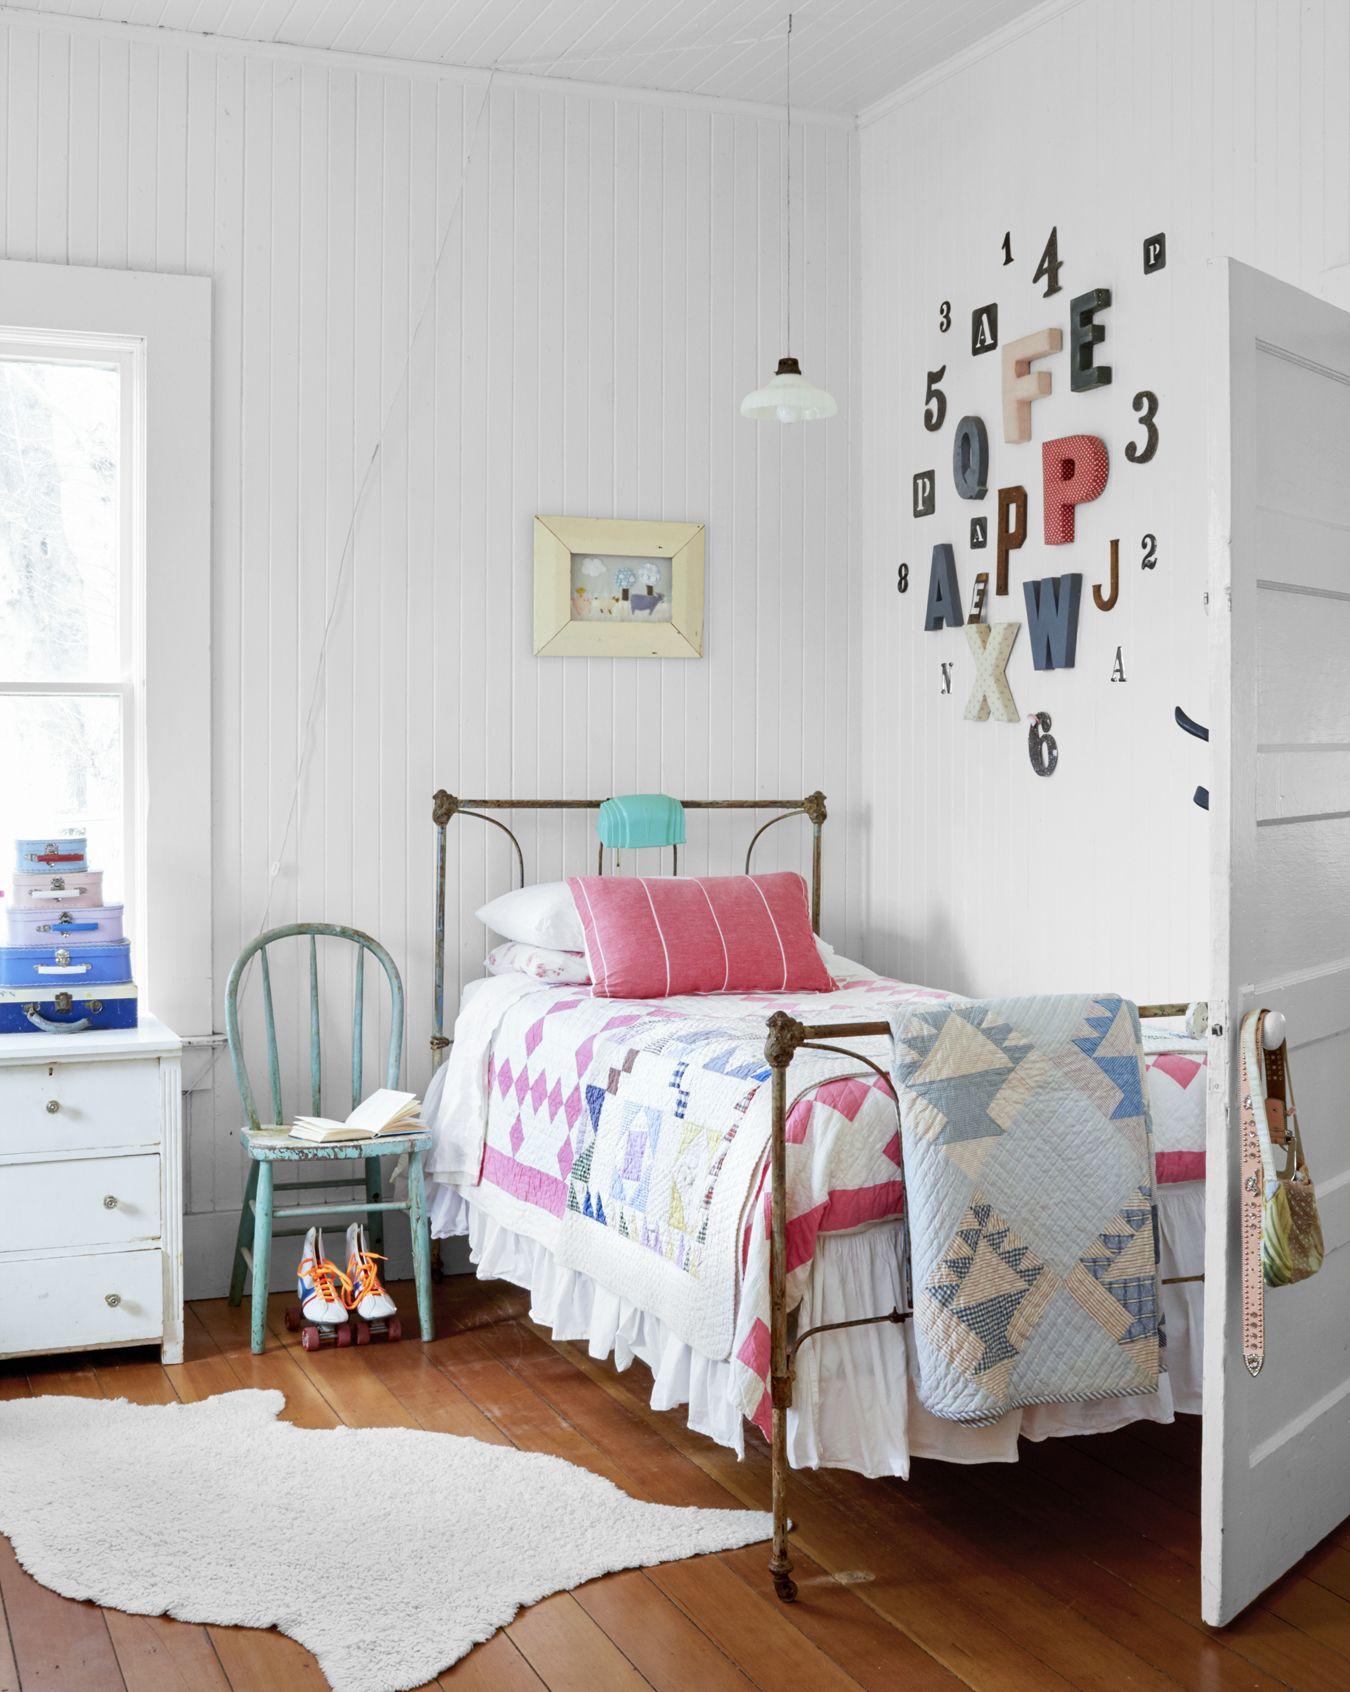 16 Vintage Decorating Ideas From Inside A 19th Century California Farmhouse Cute Bedroom Ideas Girl Bedroom Decor Girl Room